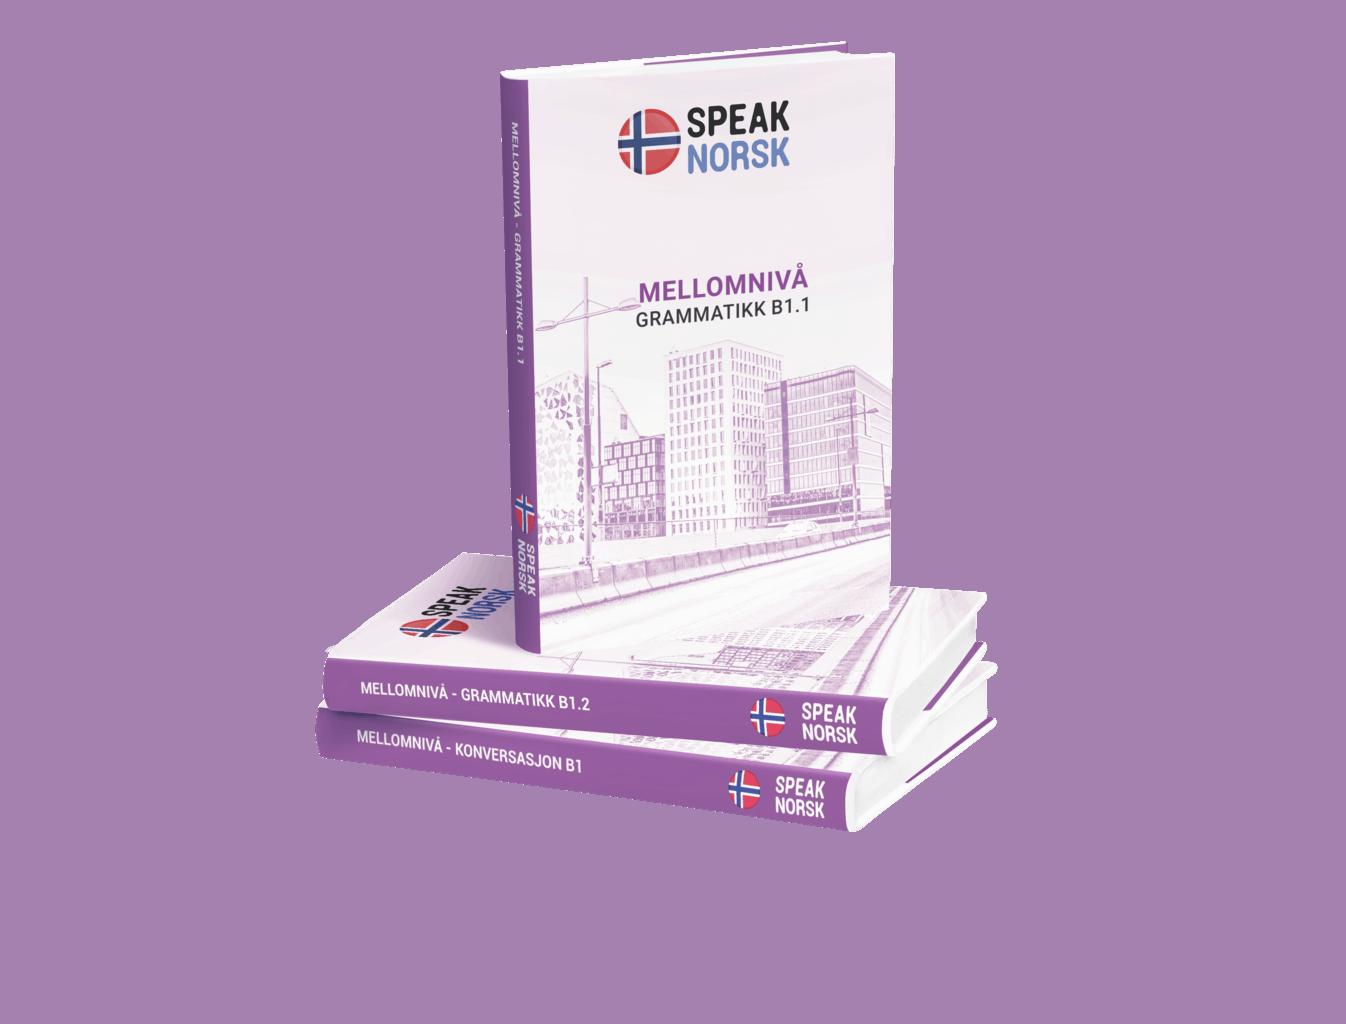 SpeakNorsk_booksB1_pile_flat fixed gram b1